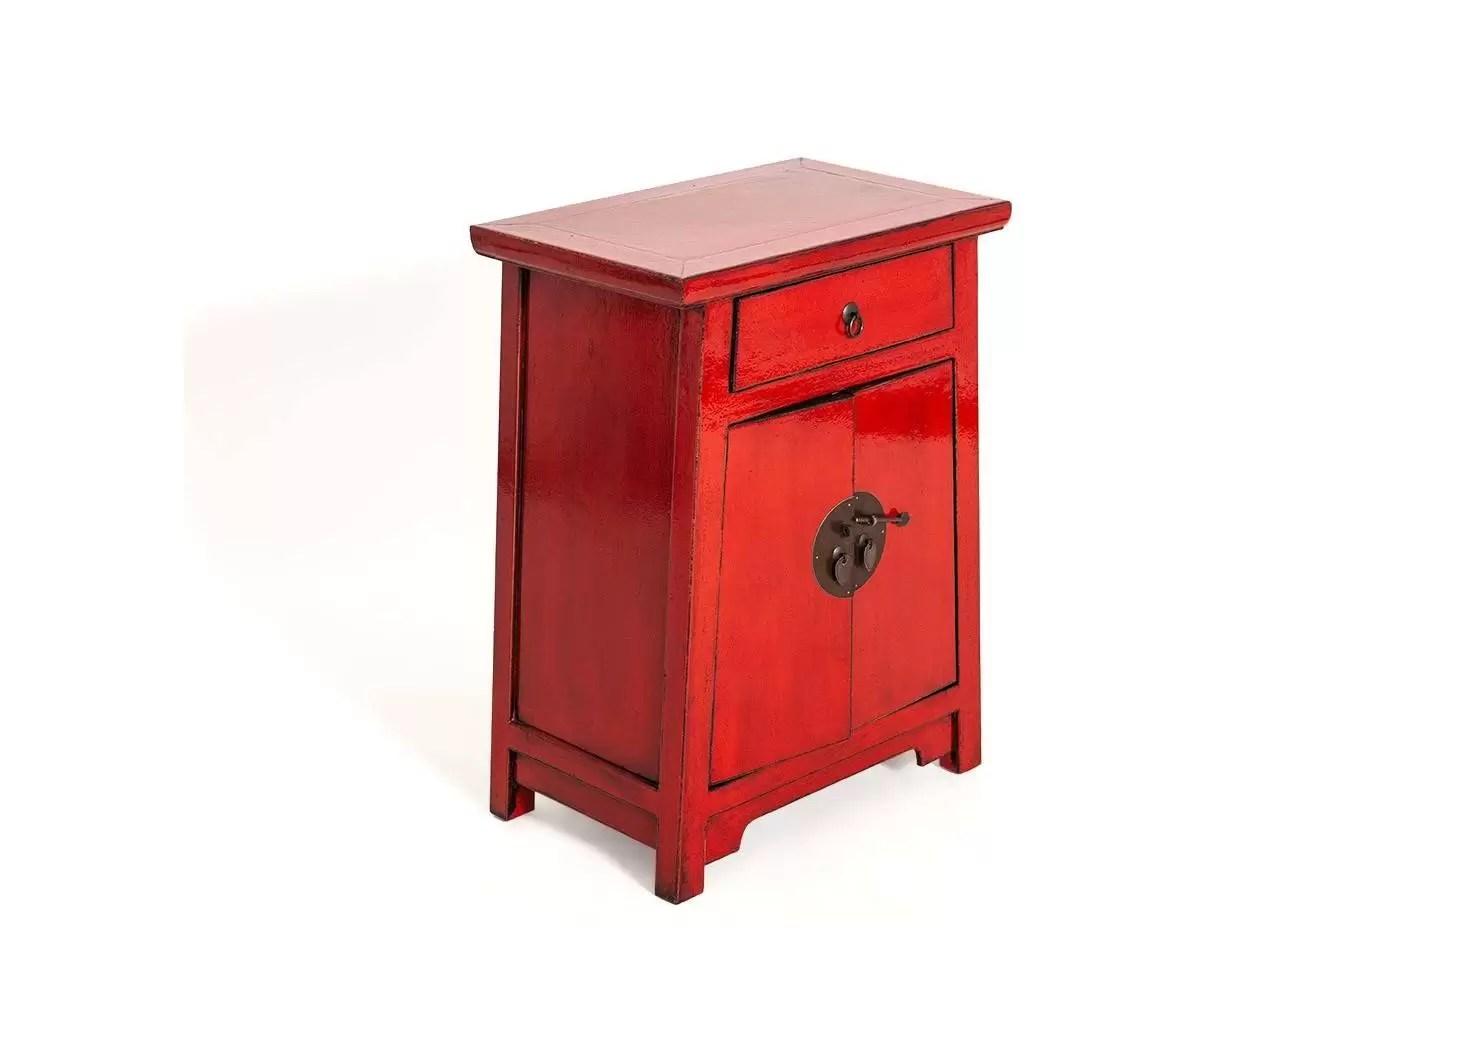 meuble d appoint chinois 2 portes 1 tiroir rouge